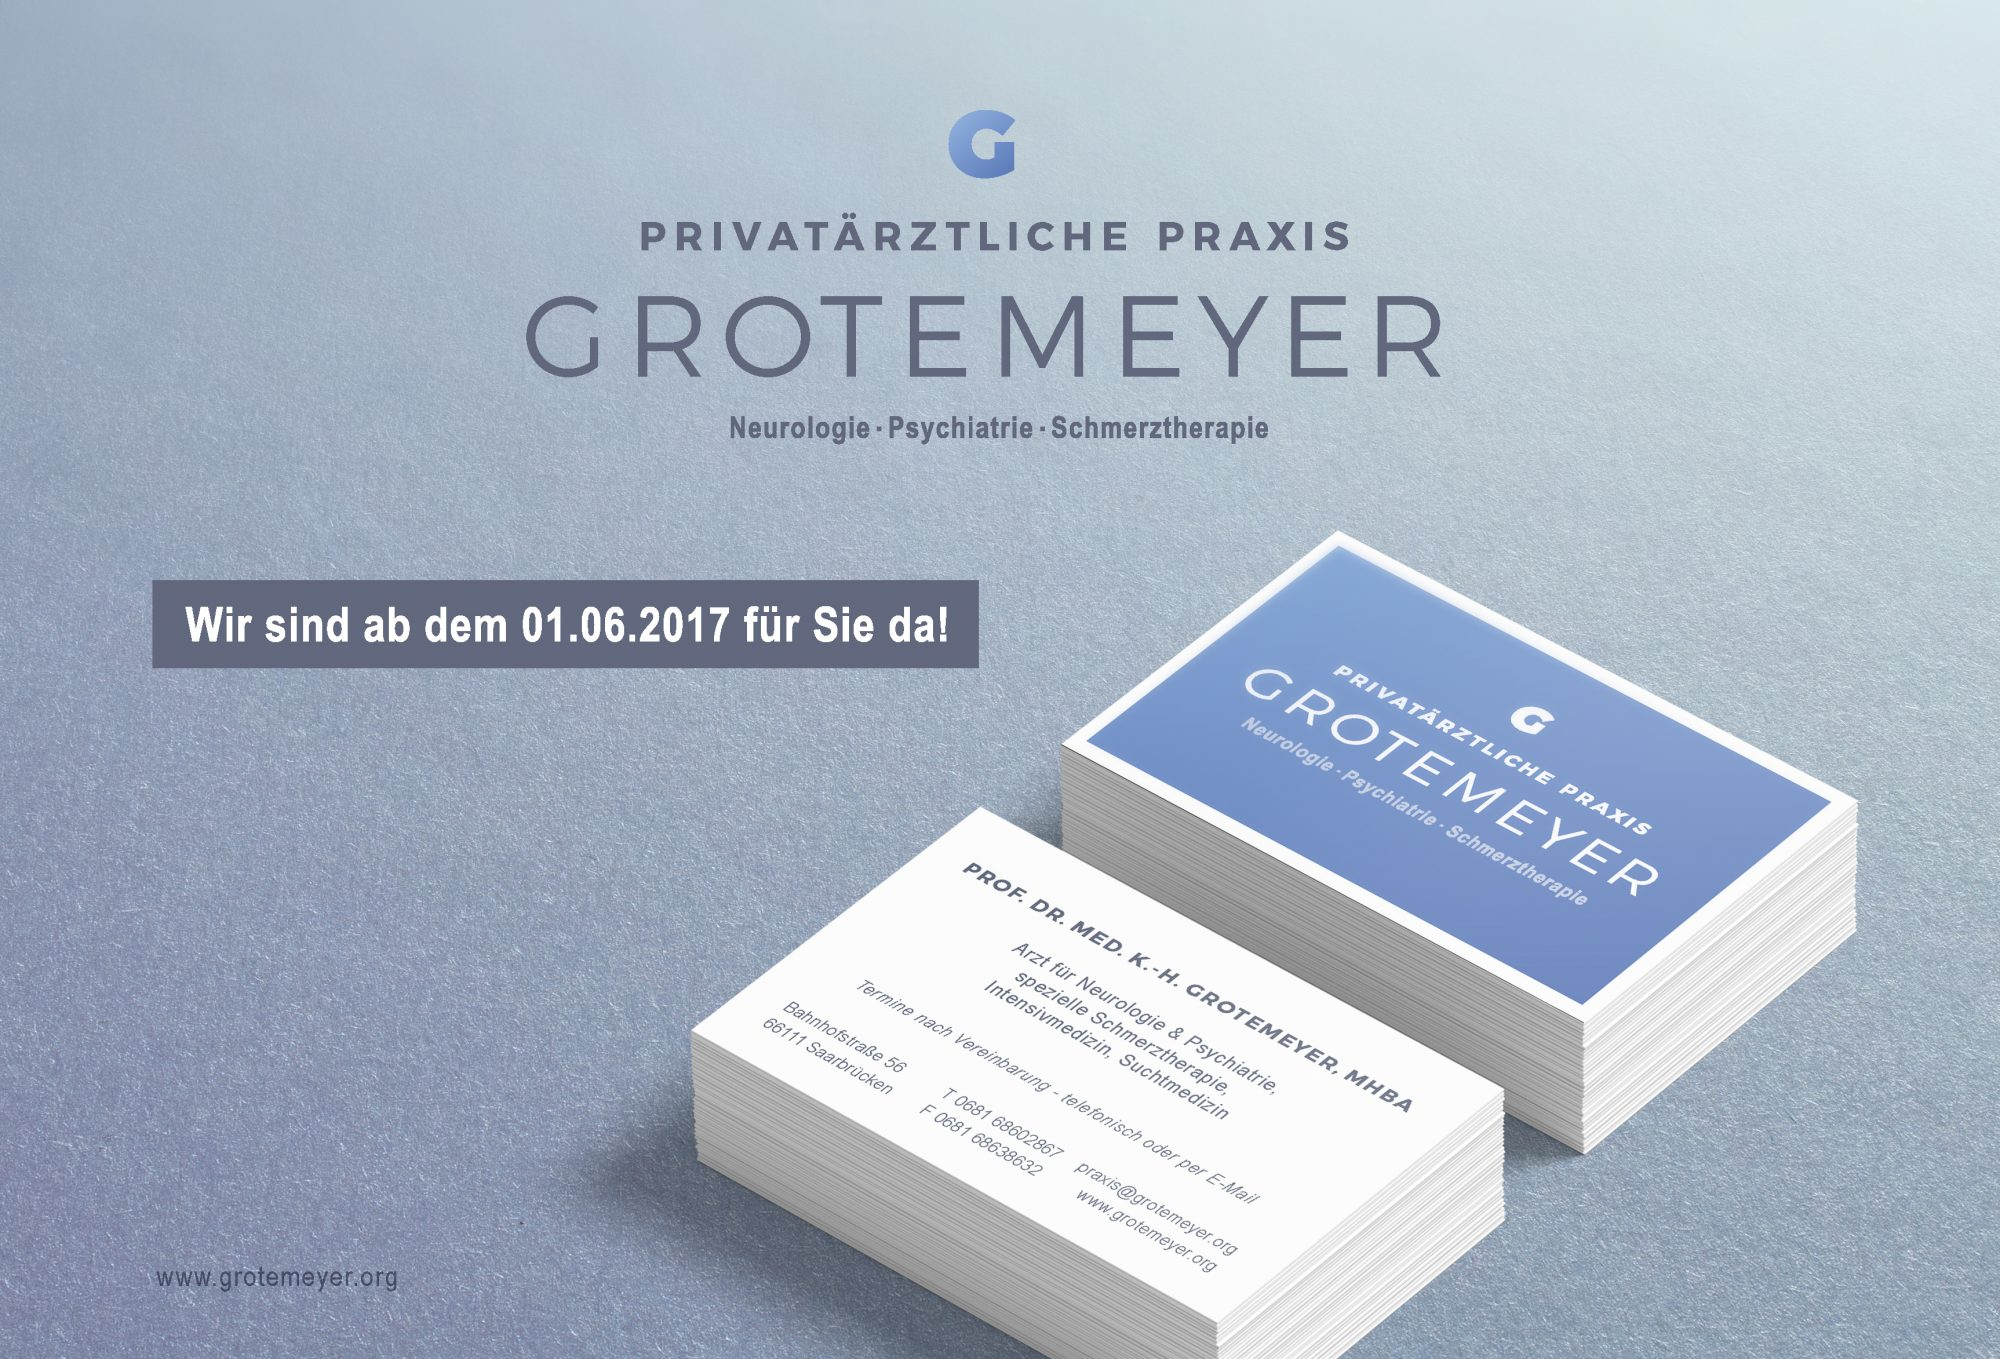 Praxis GROTEMEYER *  Saarbrücken